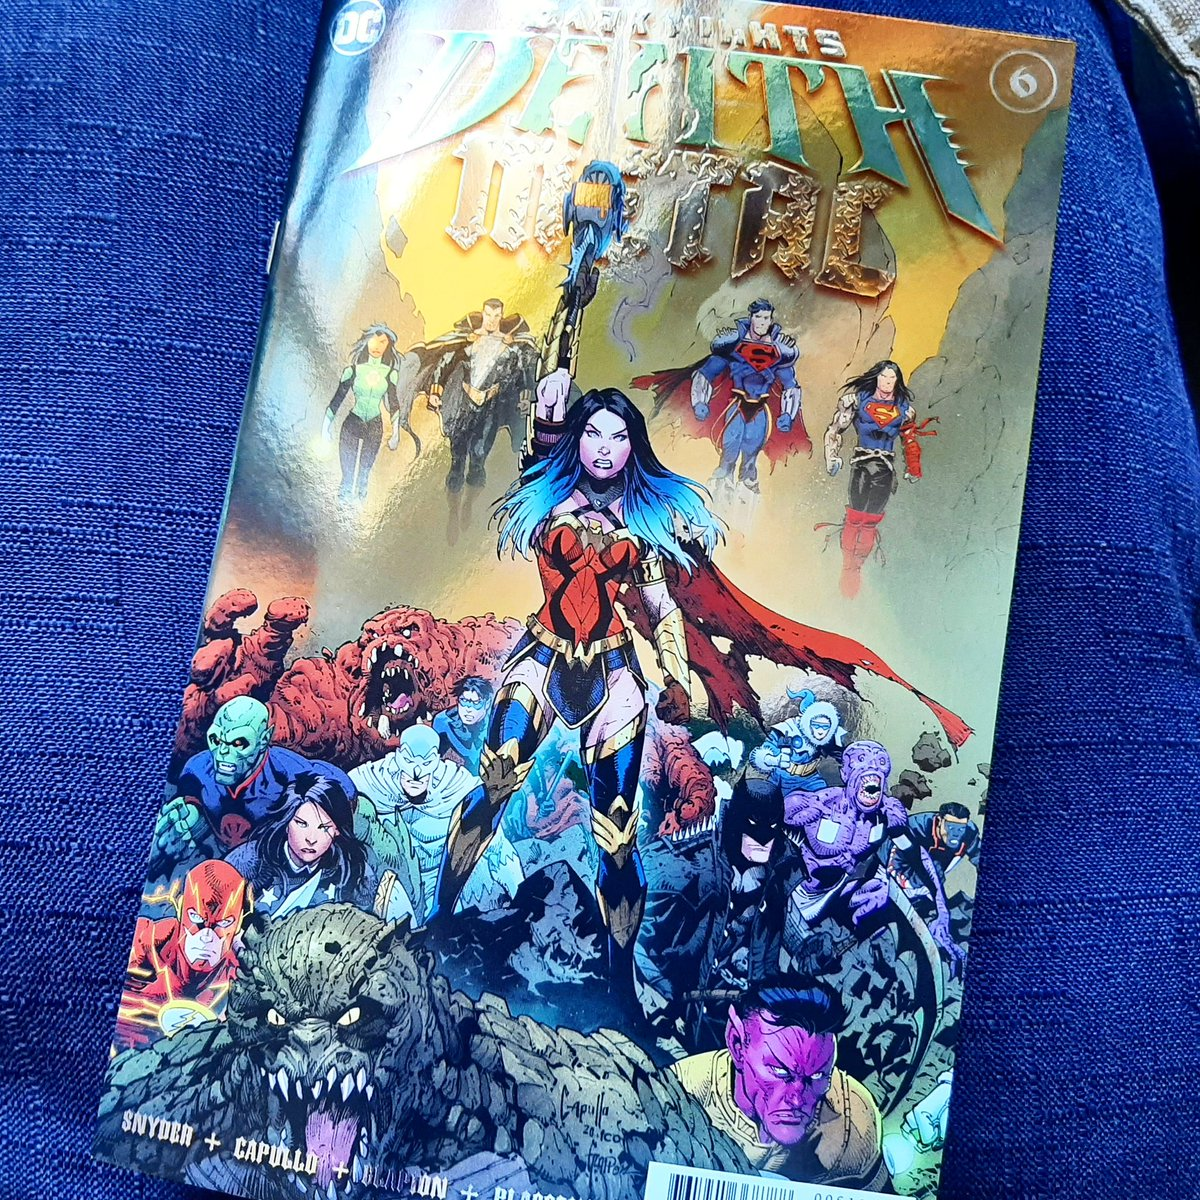 Nothing more metal than blue hair Diana wielding a cosmic chainsaw. Nothing. I 💙 this cover. 🤩🤘🏻 #DarkNightsDeathMetal #DC #ScottSnyder #GregCapullo #JonathanGlapion #FCOPlascencia #WonderWoman #KillerCroc #Sinestro #Flash #DonnaTroy #Batman #HawkandDove #MartianManhunter